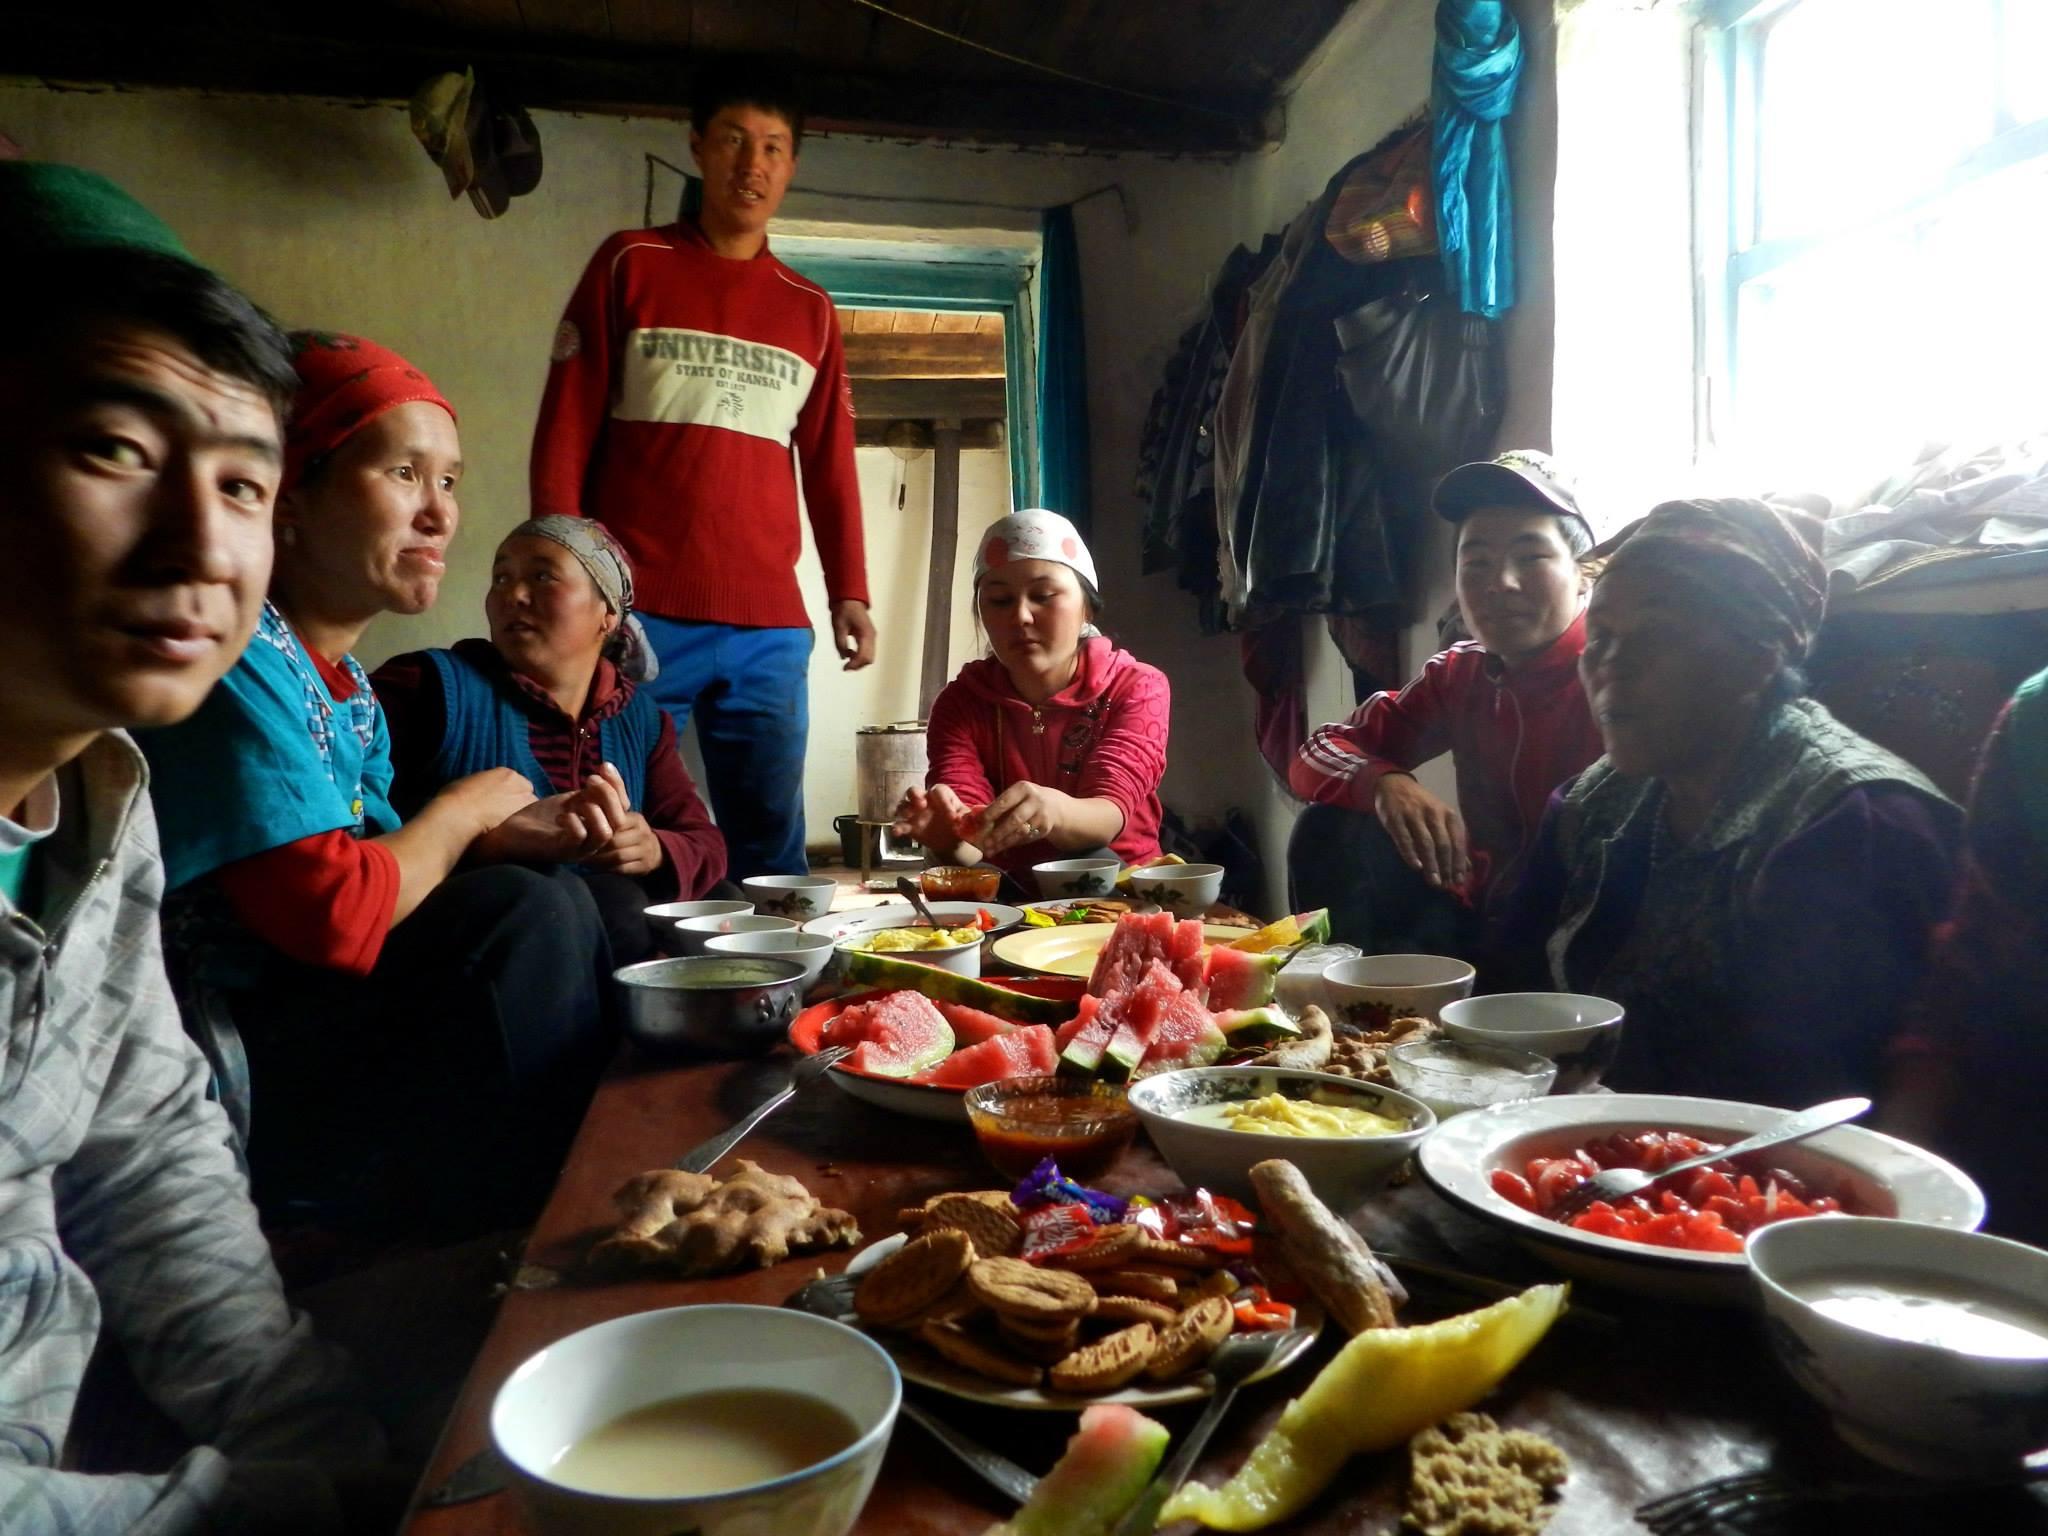 юрта внутри :)))) нарын. путешествия кати. киргизия